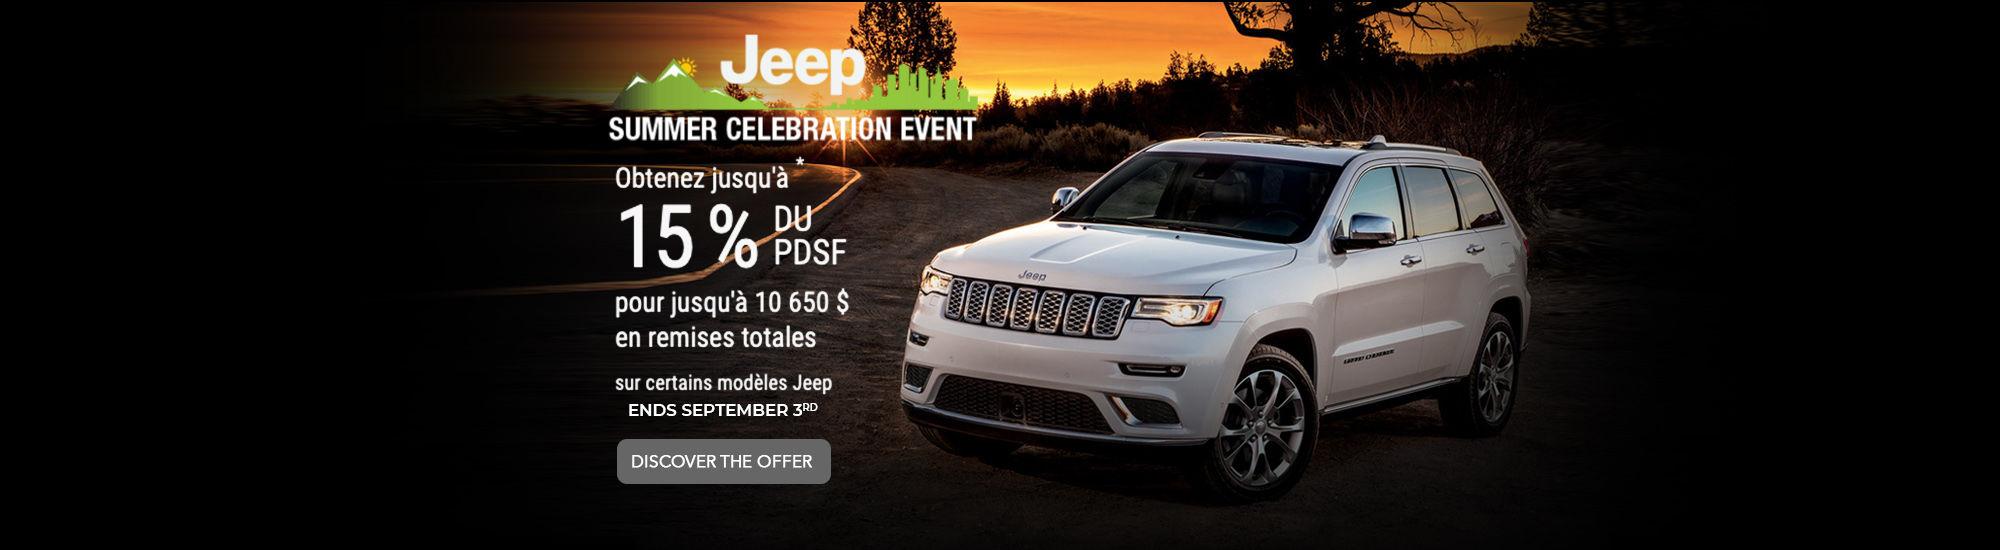 Summer days event Jeep